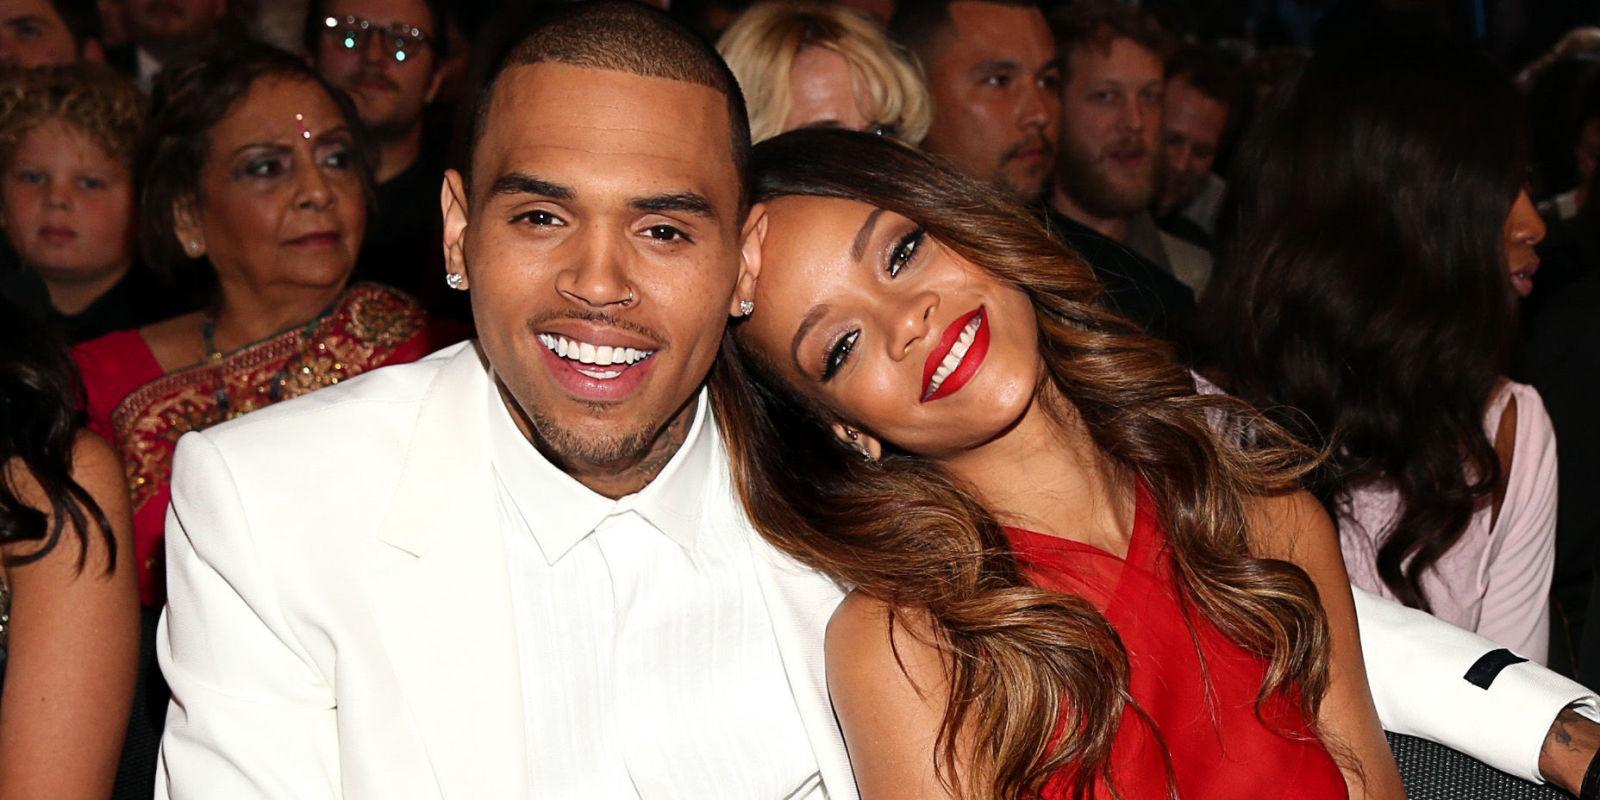 SNAP Ad Asks Rather Slap Rihanna Or Punch Chris Brown